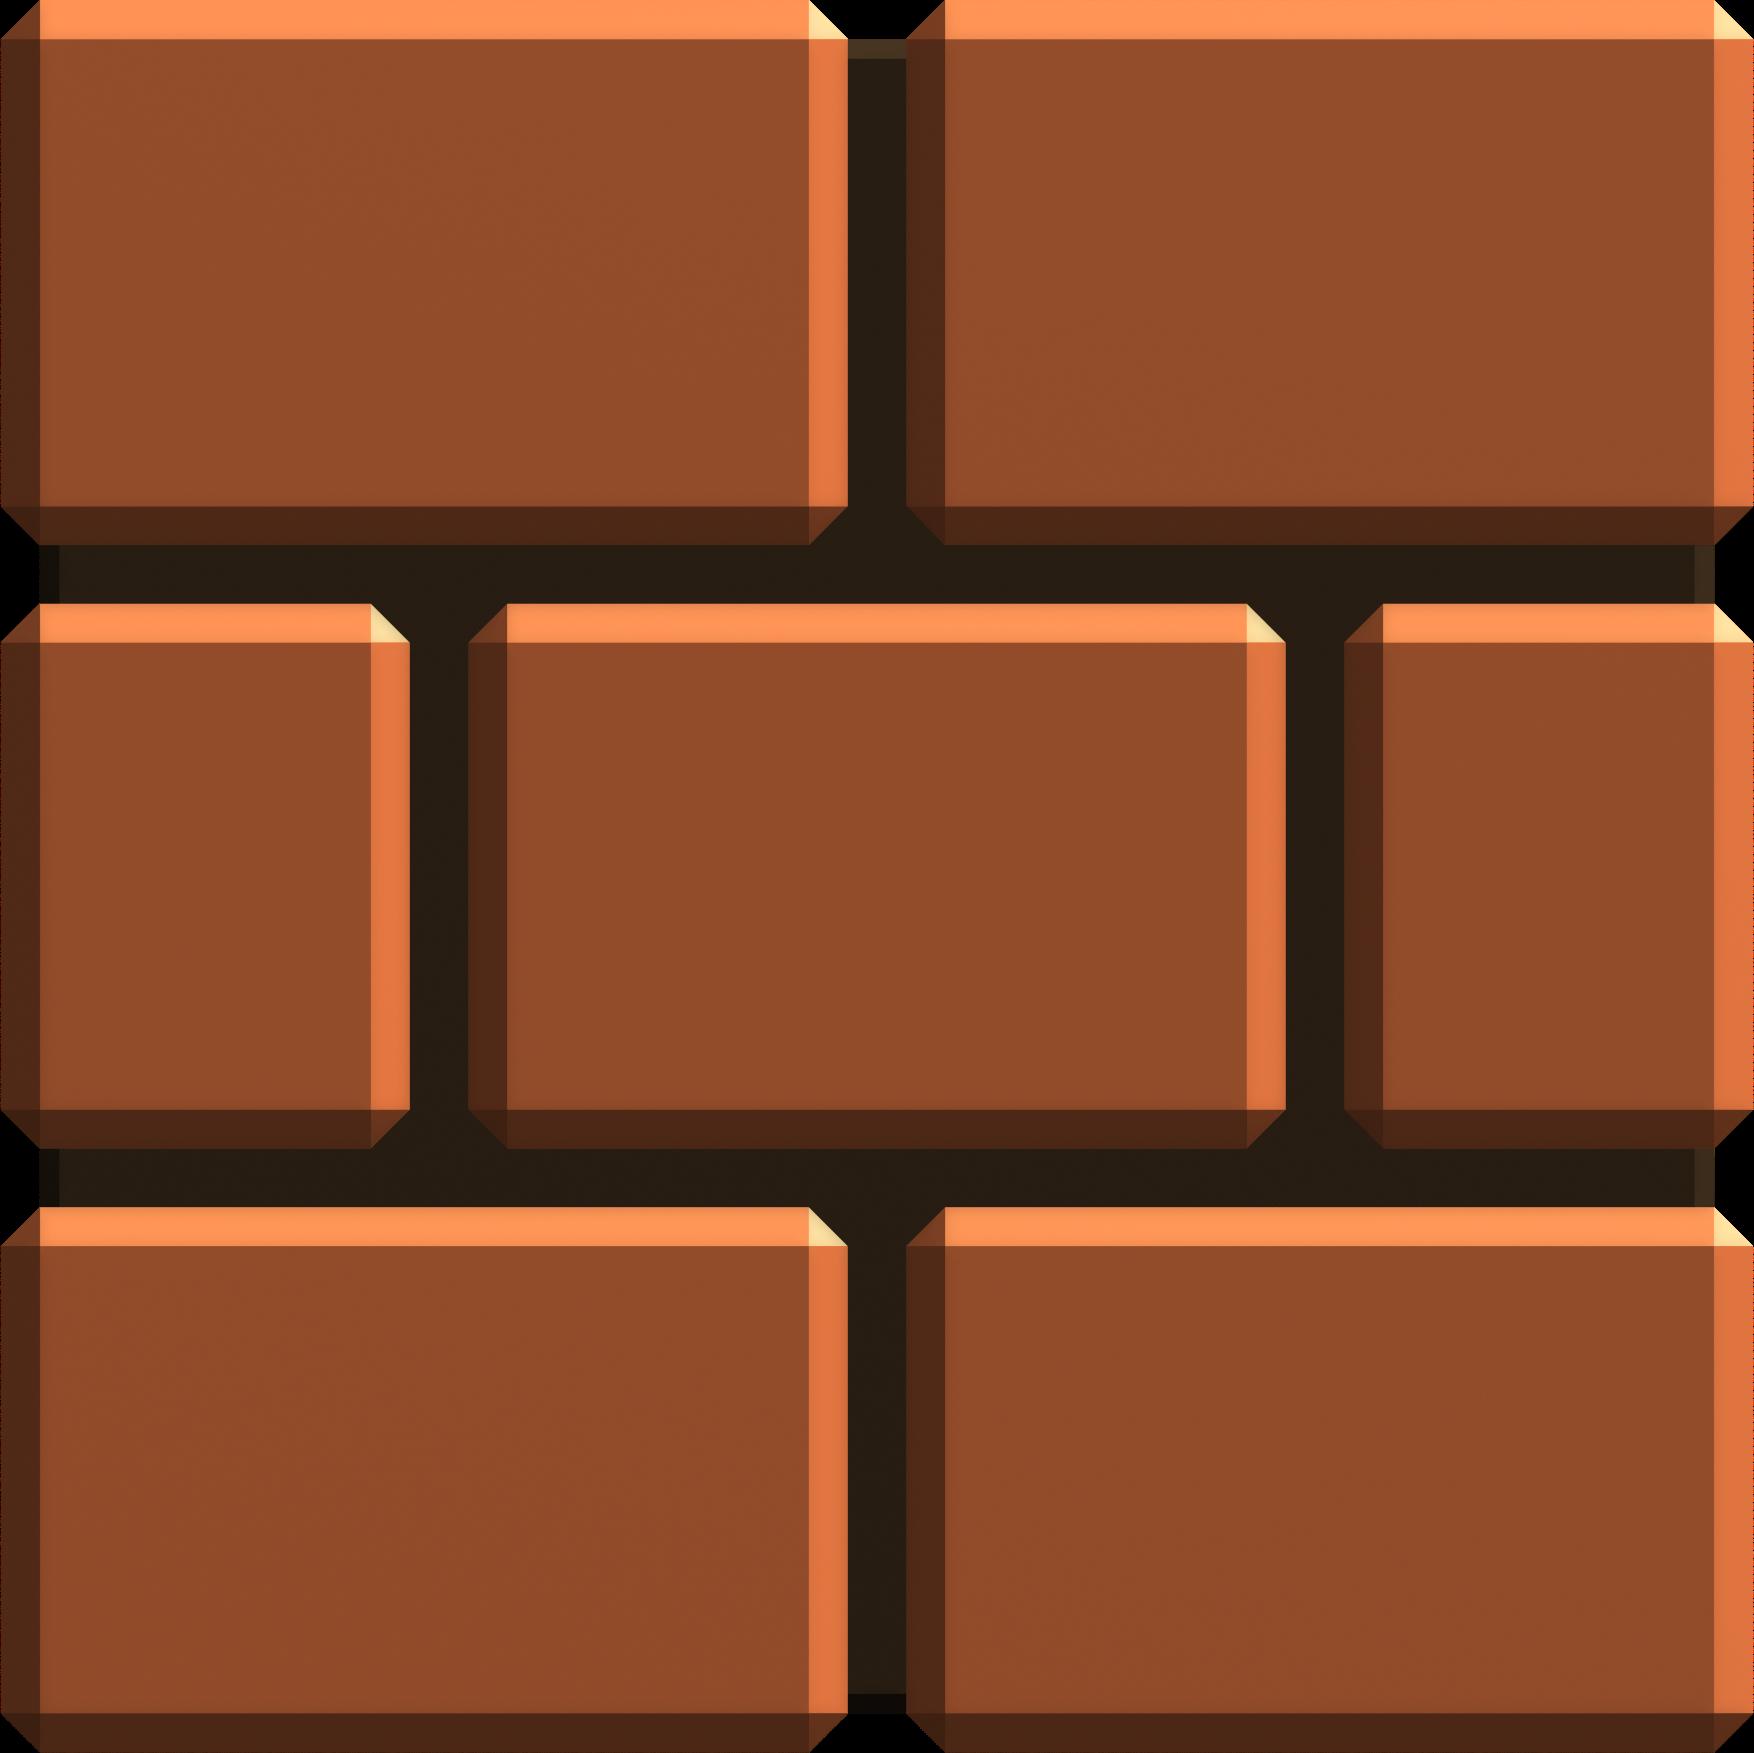 Brick Block Fantendo Nintendo Fanon Wiki Fandom